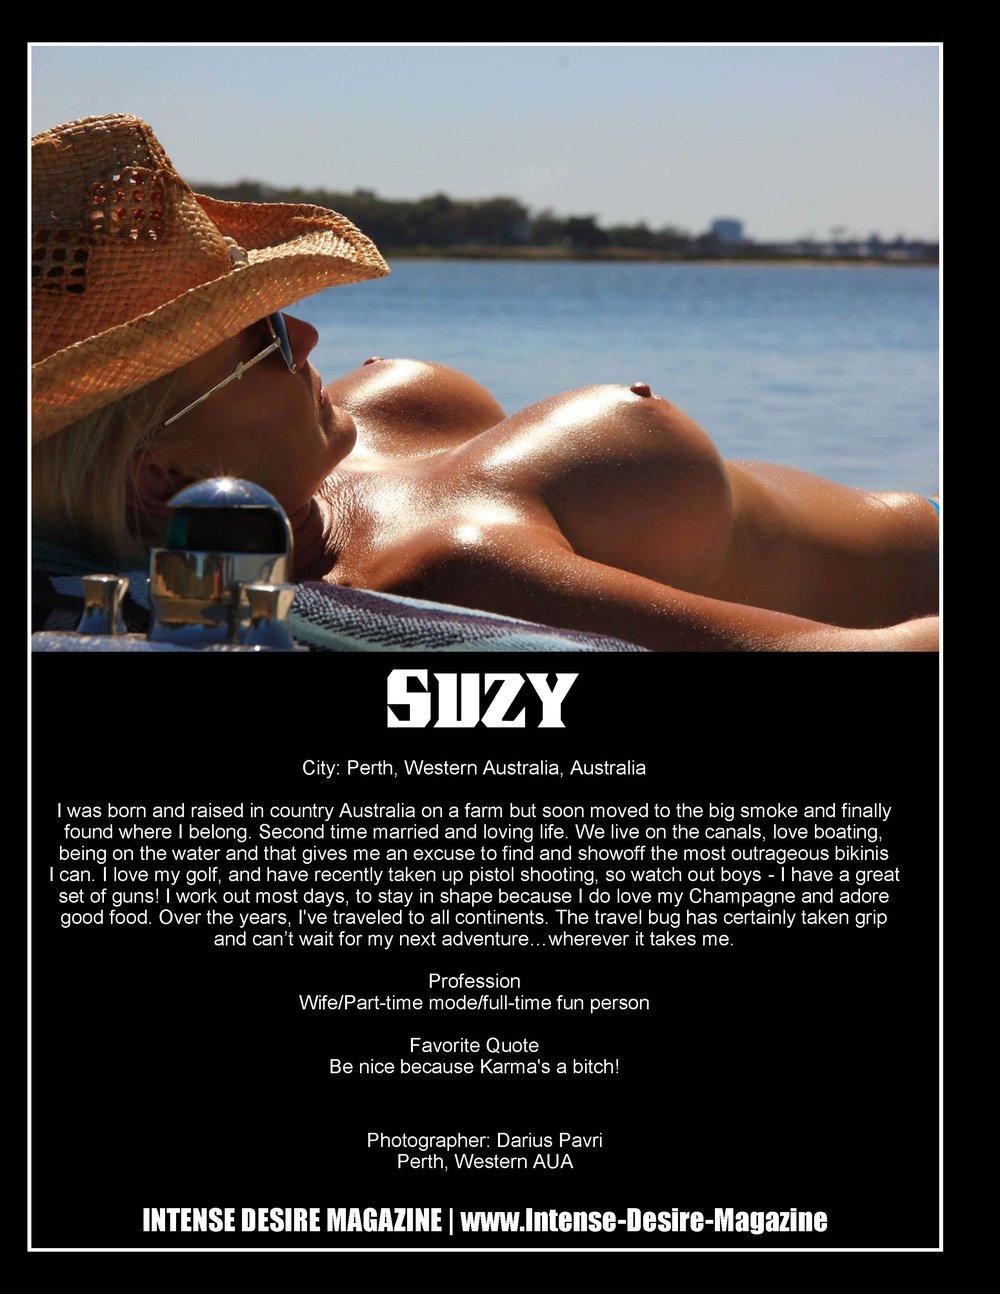 Suzy - Australia